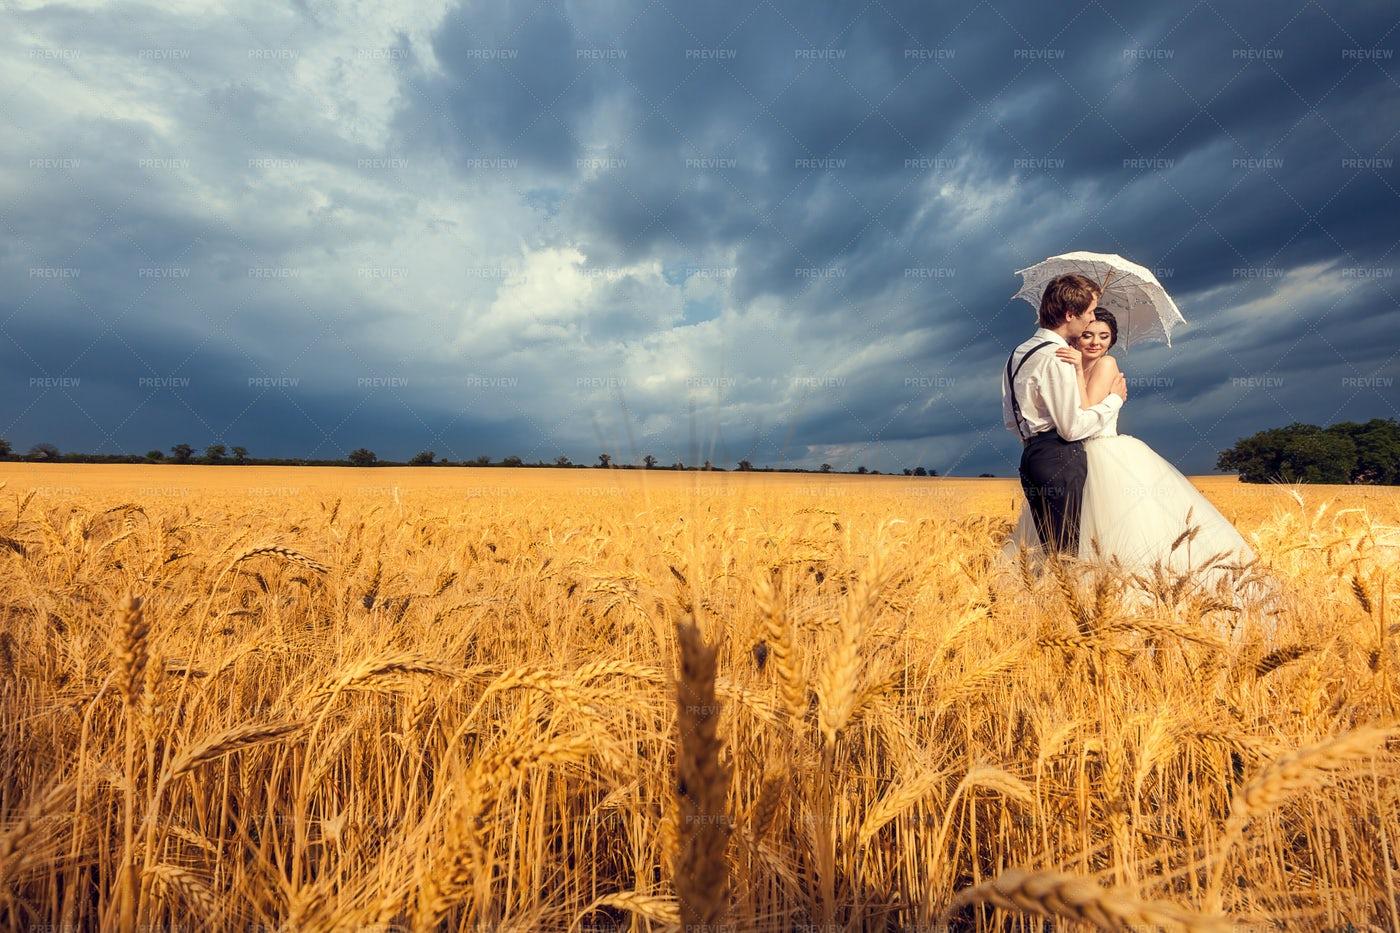 Wedding Photo In Magic Wheat Field: Stock Photos